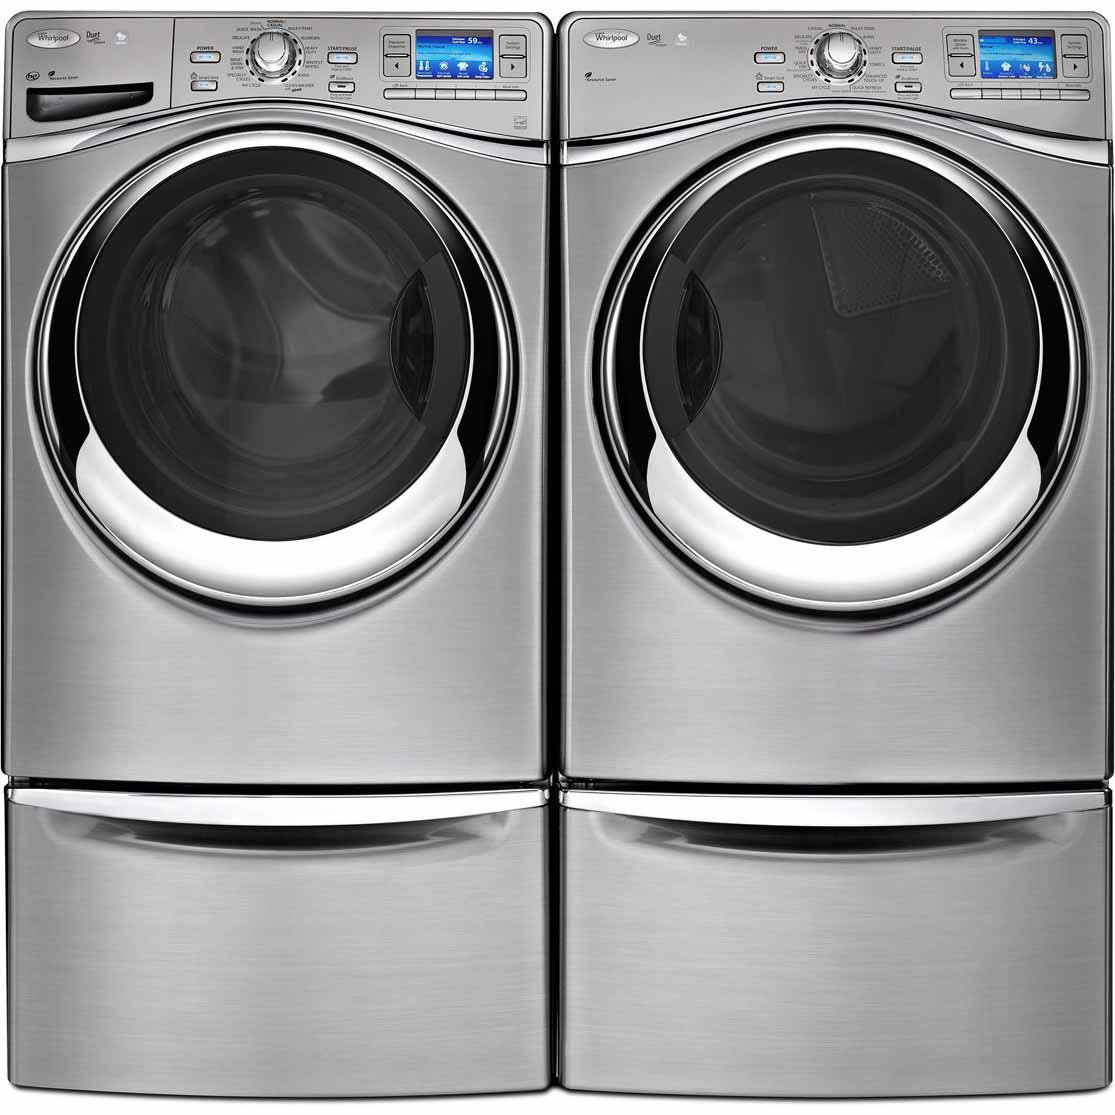 Whirlpool WEL98HEBU 7.4 cu. ft. Smart Electric Dryer w/ 6th Sense Live™ Technology - Diamond Steel